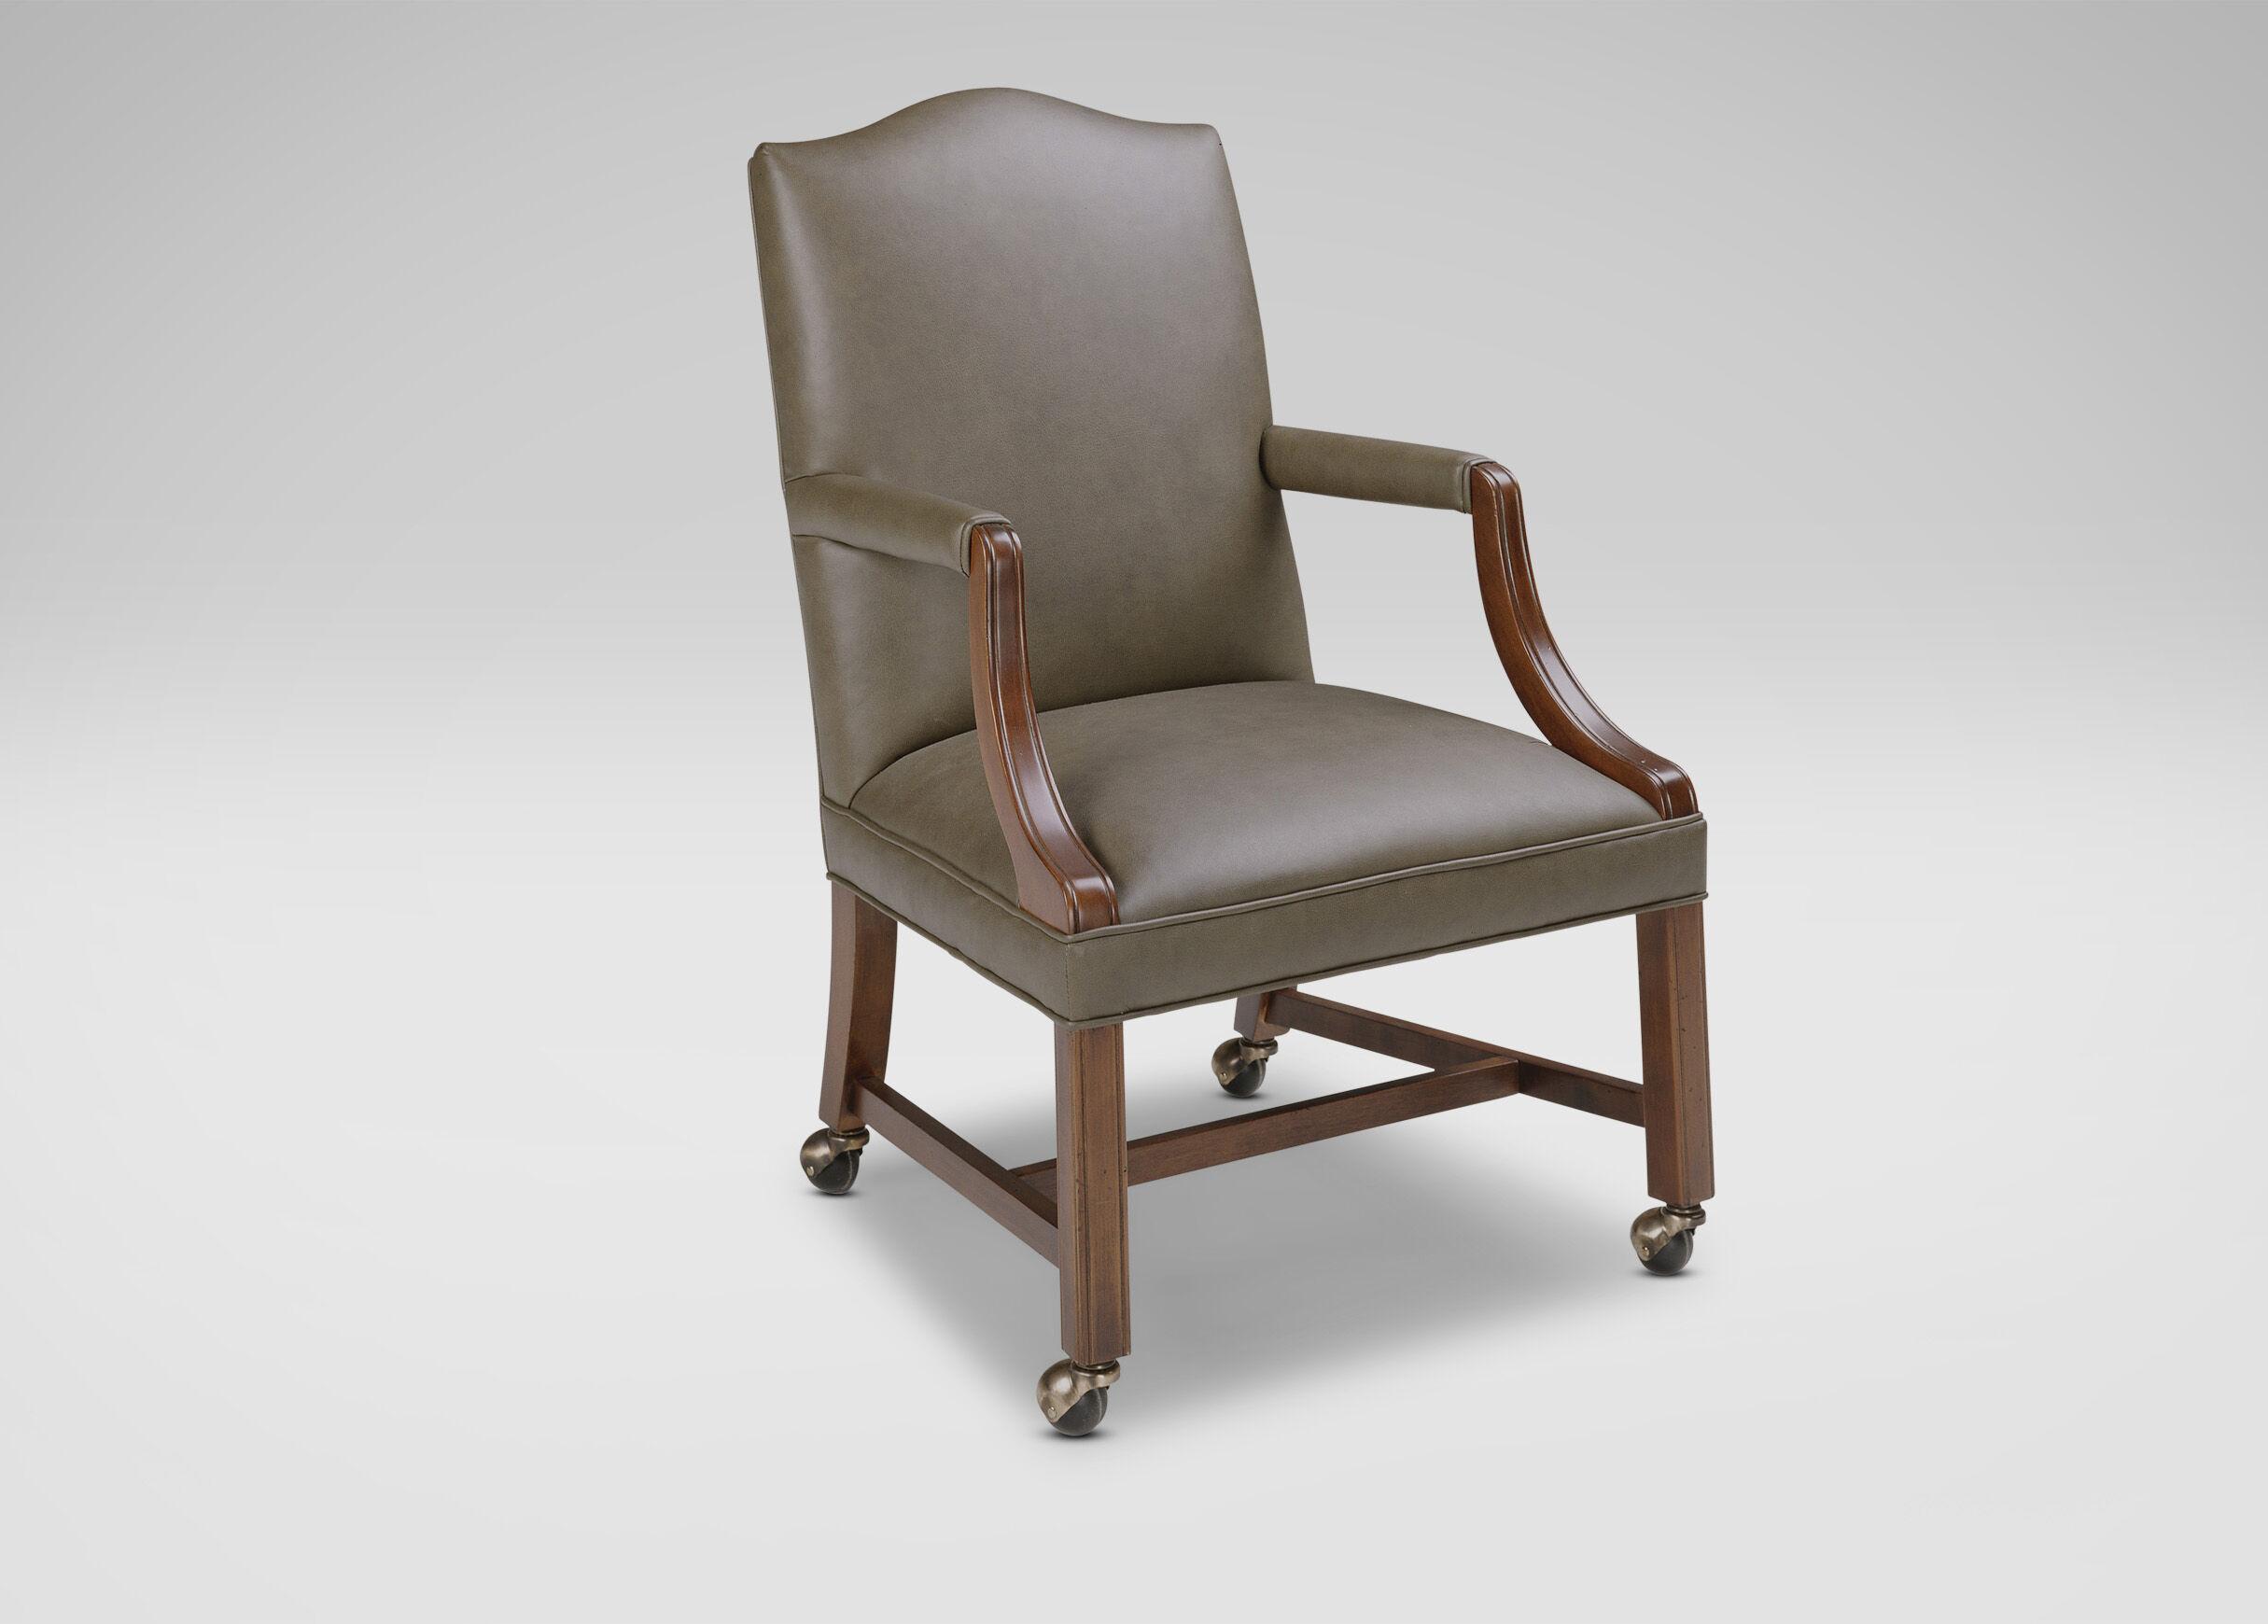 ergonomic chair bangladesh mobile pedicure clarke leather desk ethan allen